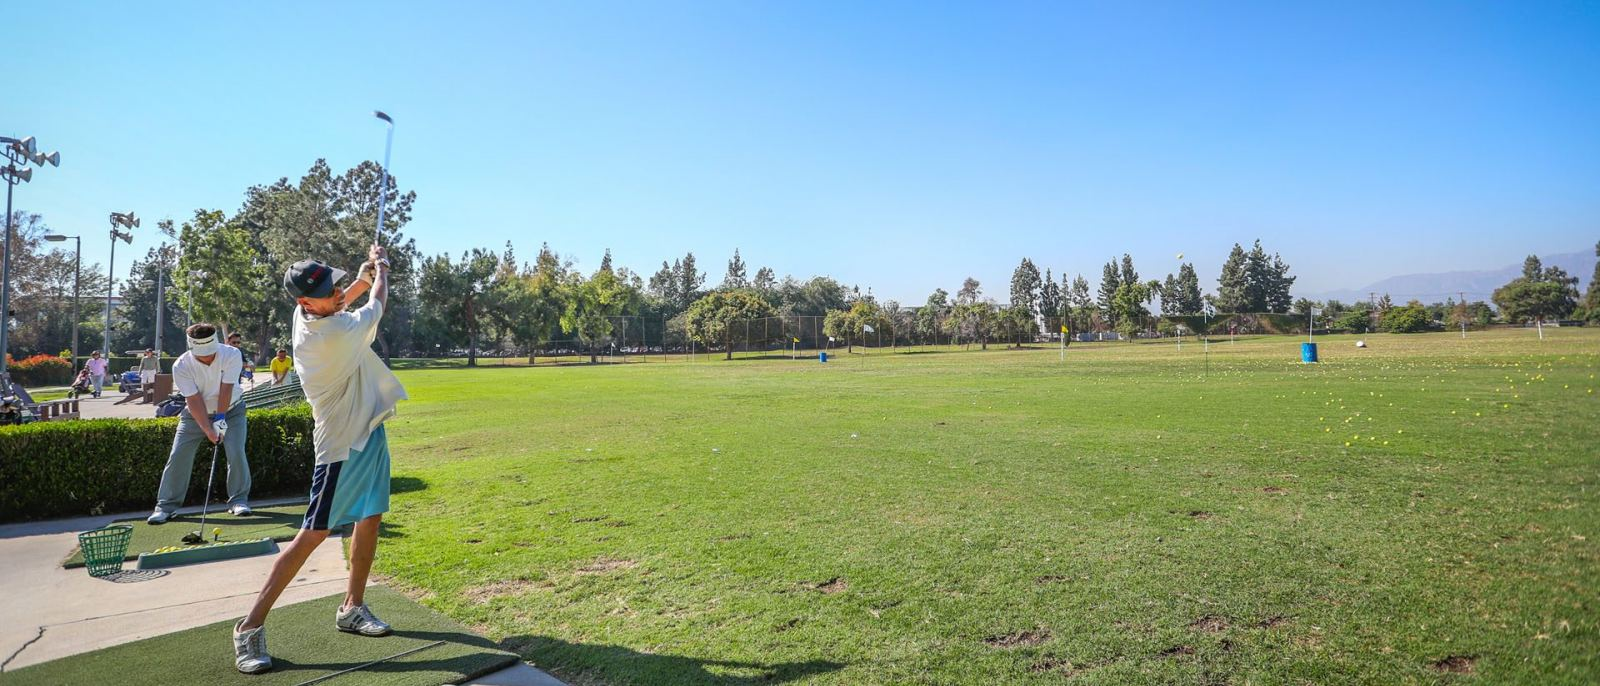 Whittier Narrows Golf Course driving range